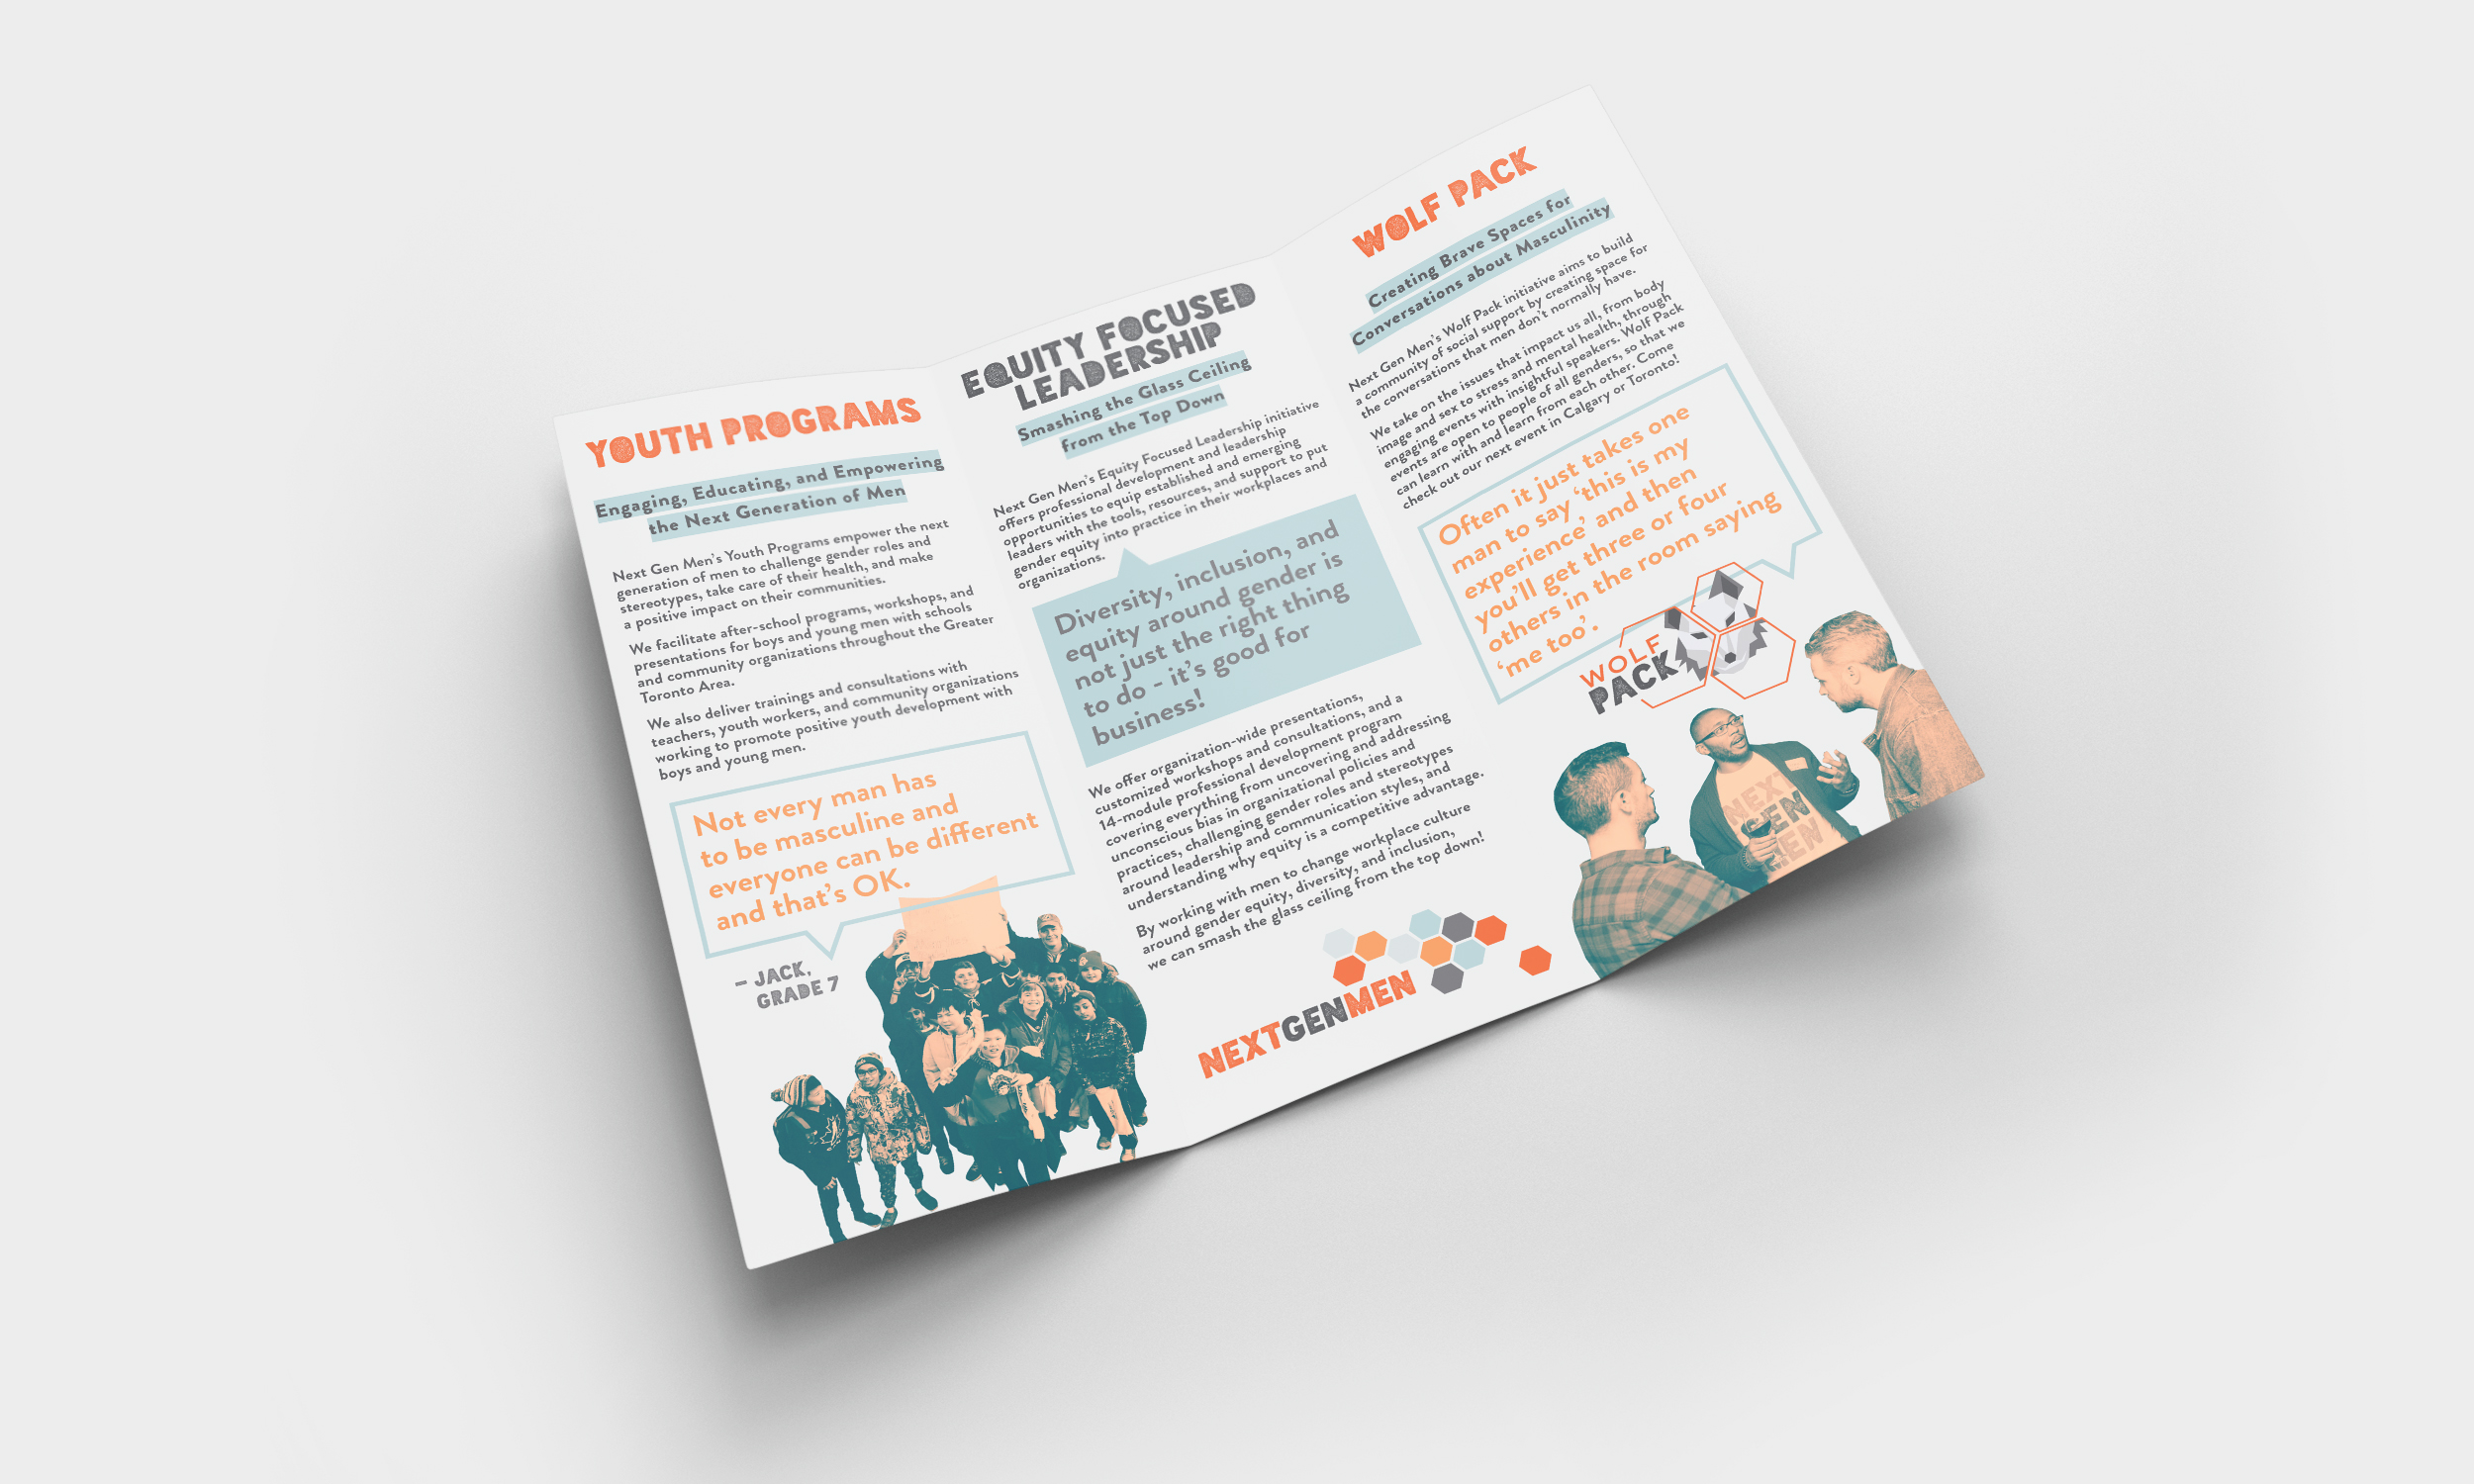 katelynbishop_design_nextgenmen_brochure2